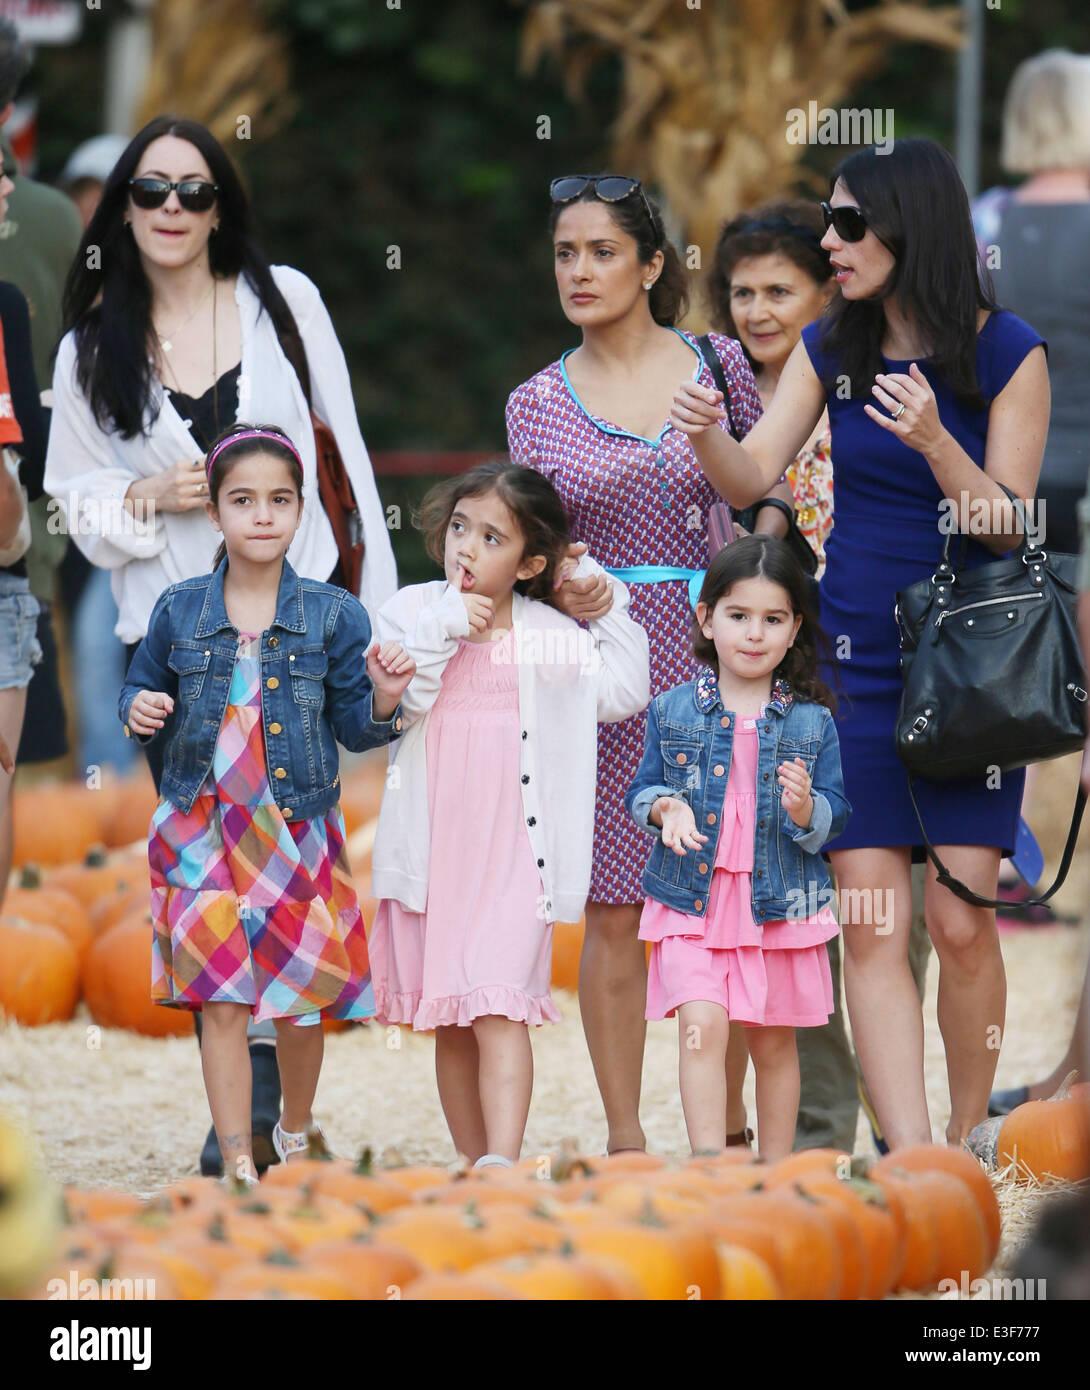 Salma Hayek takes her daughter Valentina Pinault to Mr Bones